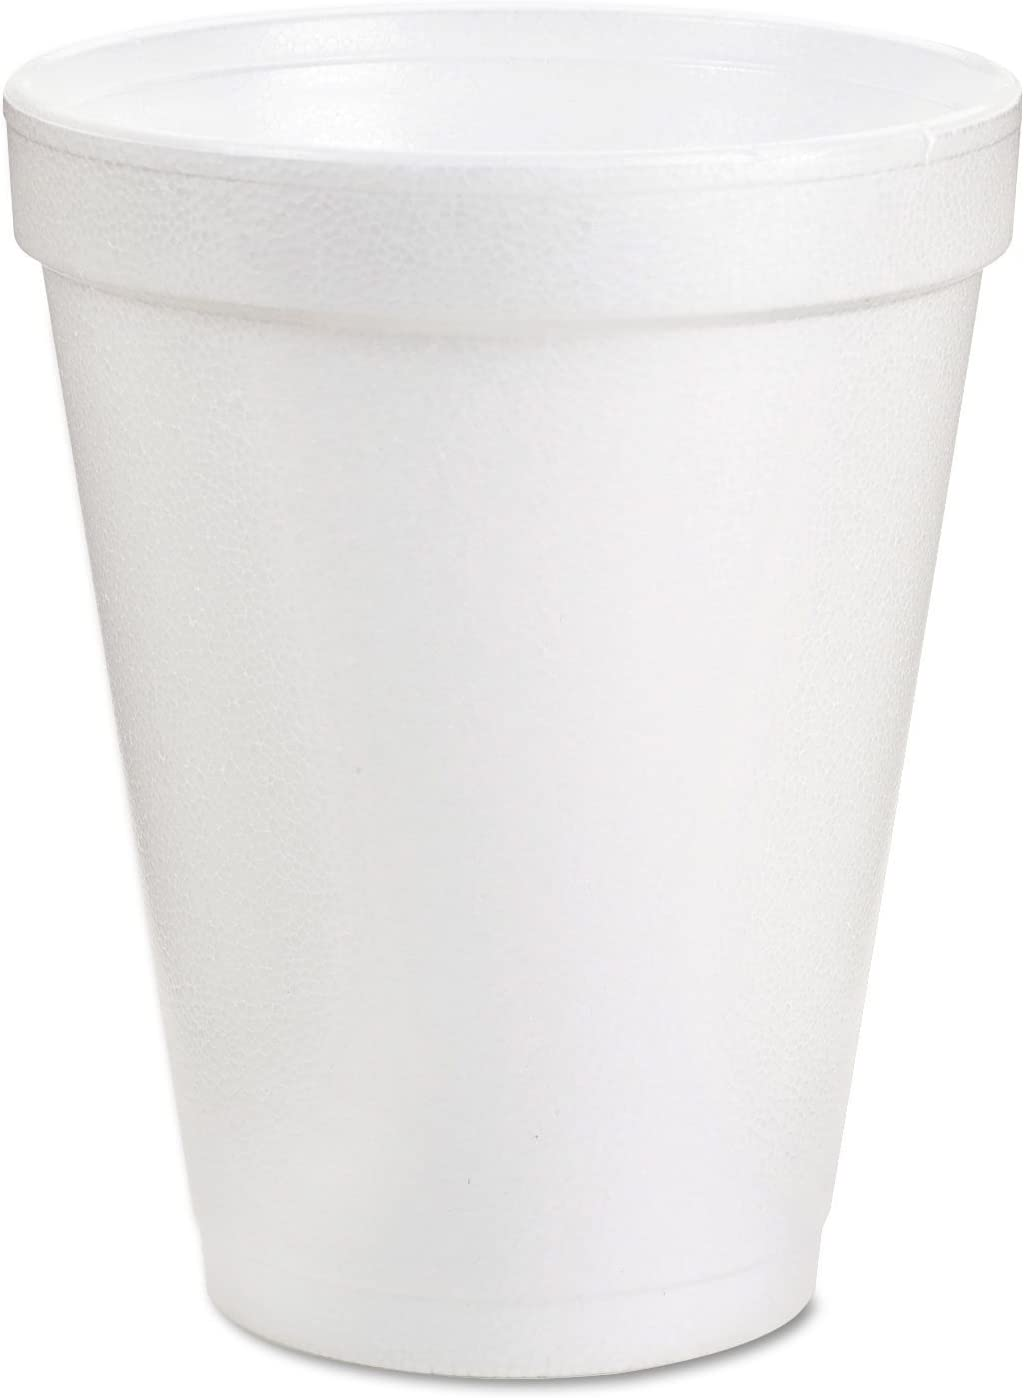 Dart 10J10 Foam Drink Cups, 10oz, White, 25/Bag, 40 Bags/Carton